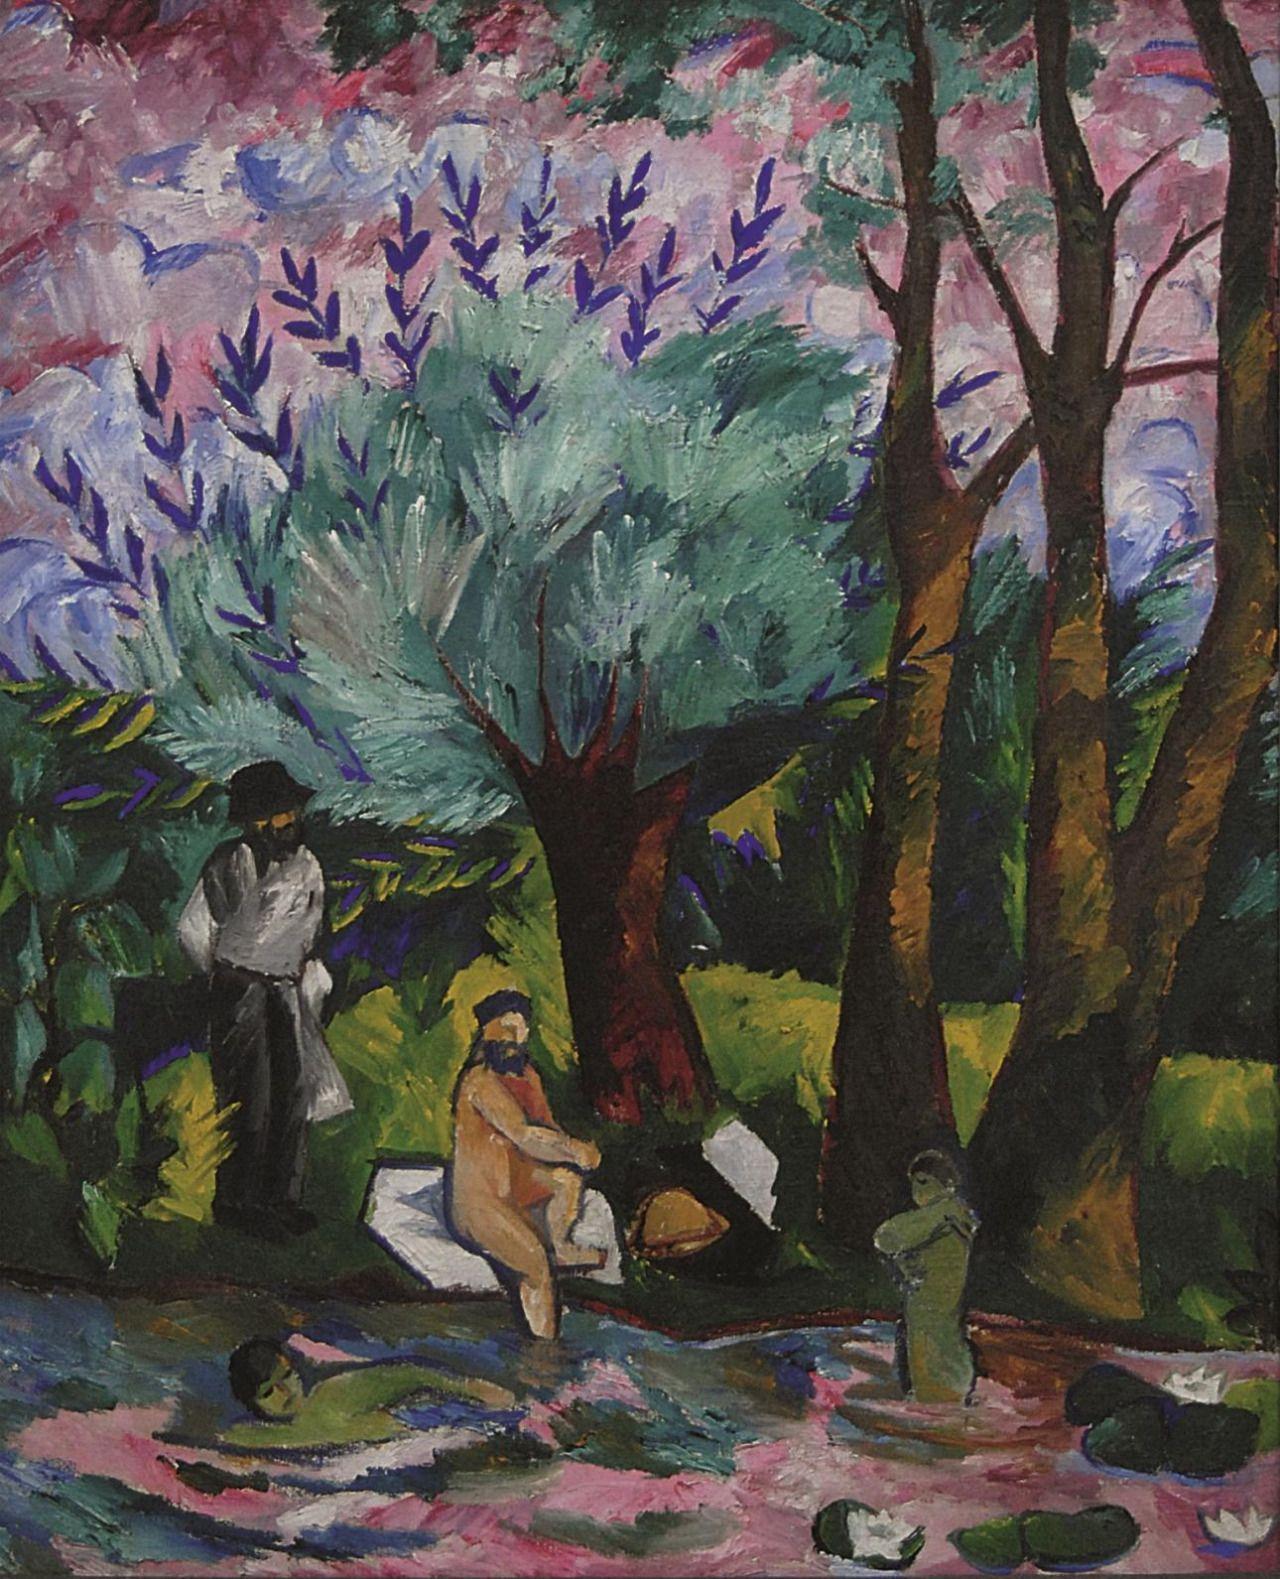 Alongtimealone Lawrenceleemagnuson Natalia Goncharova Art Cubist Art Art Reproductions